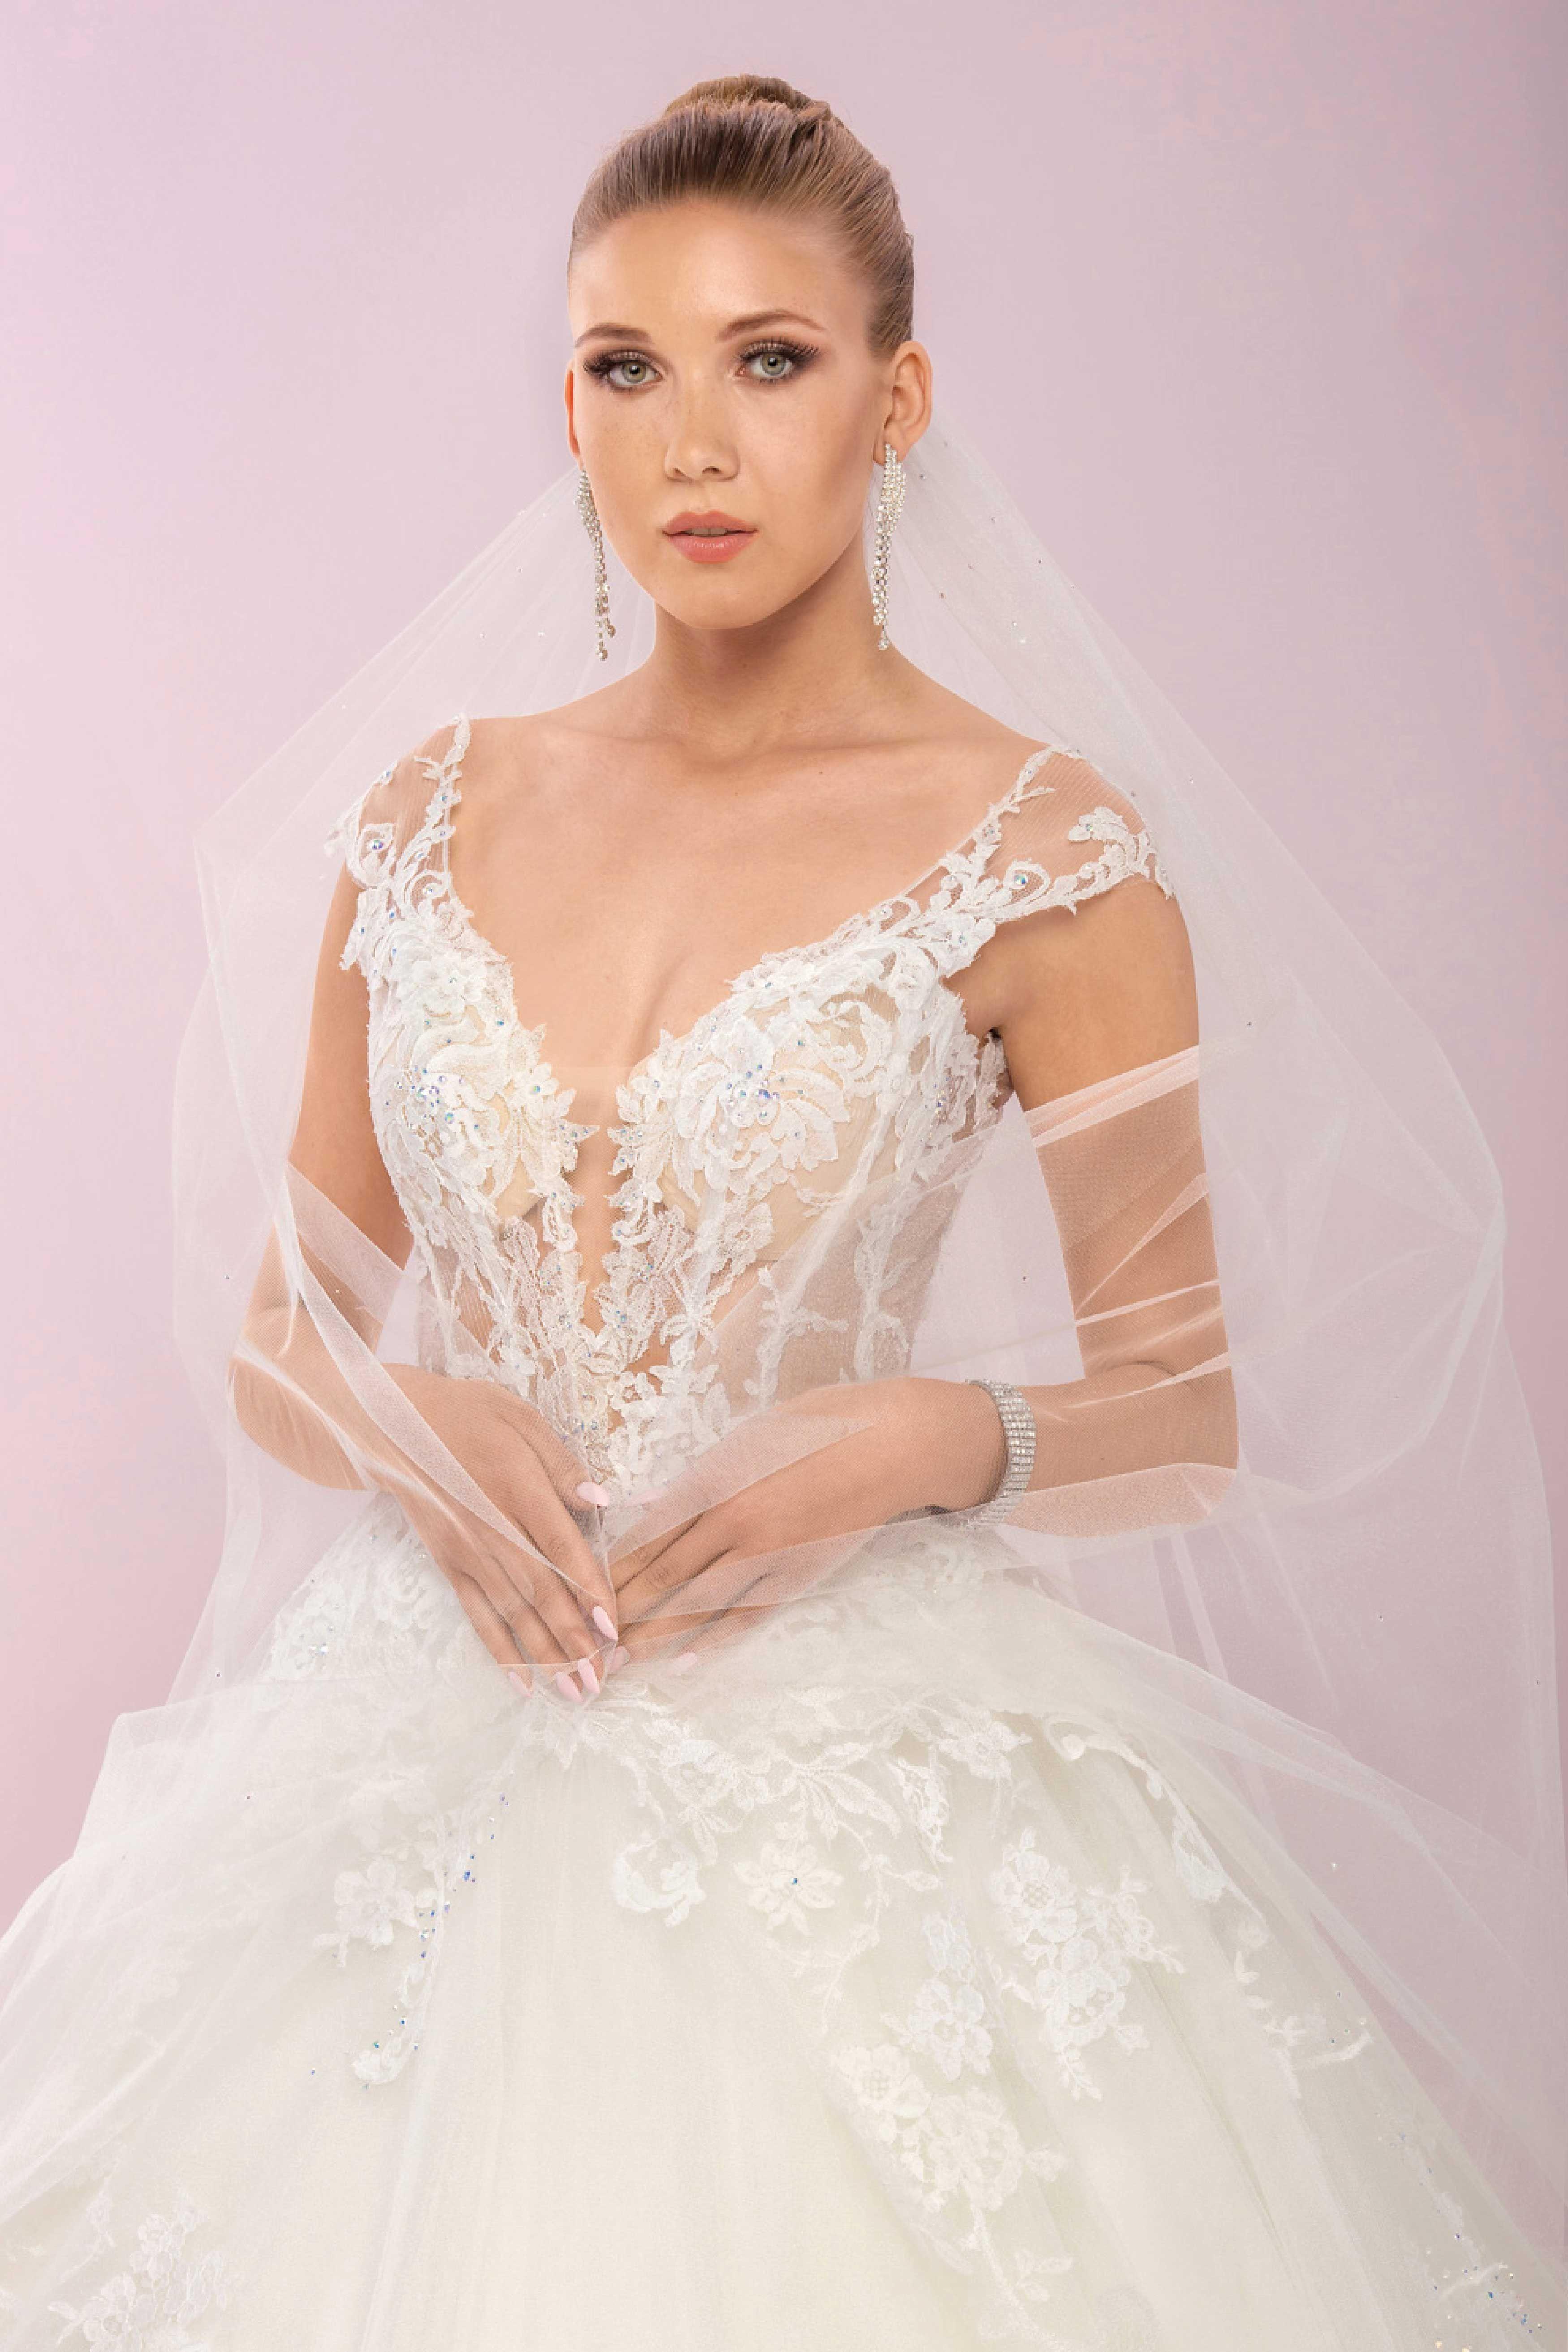 sale retailer 13de5 4982b Brautmode Agora | BRAUTMODE AGORA KOLLEKTION 2019 IN KÖLN ...